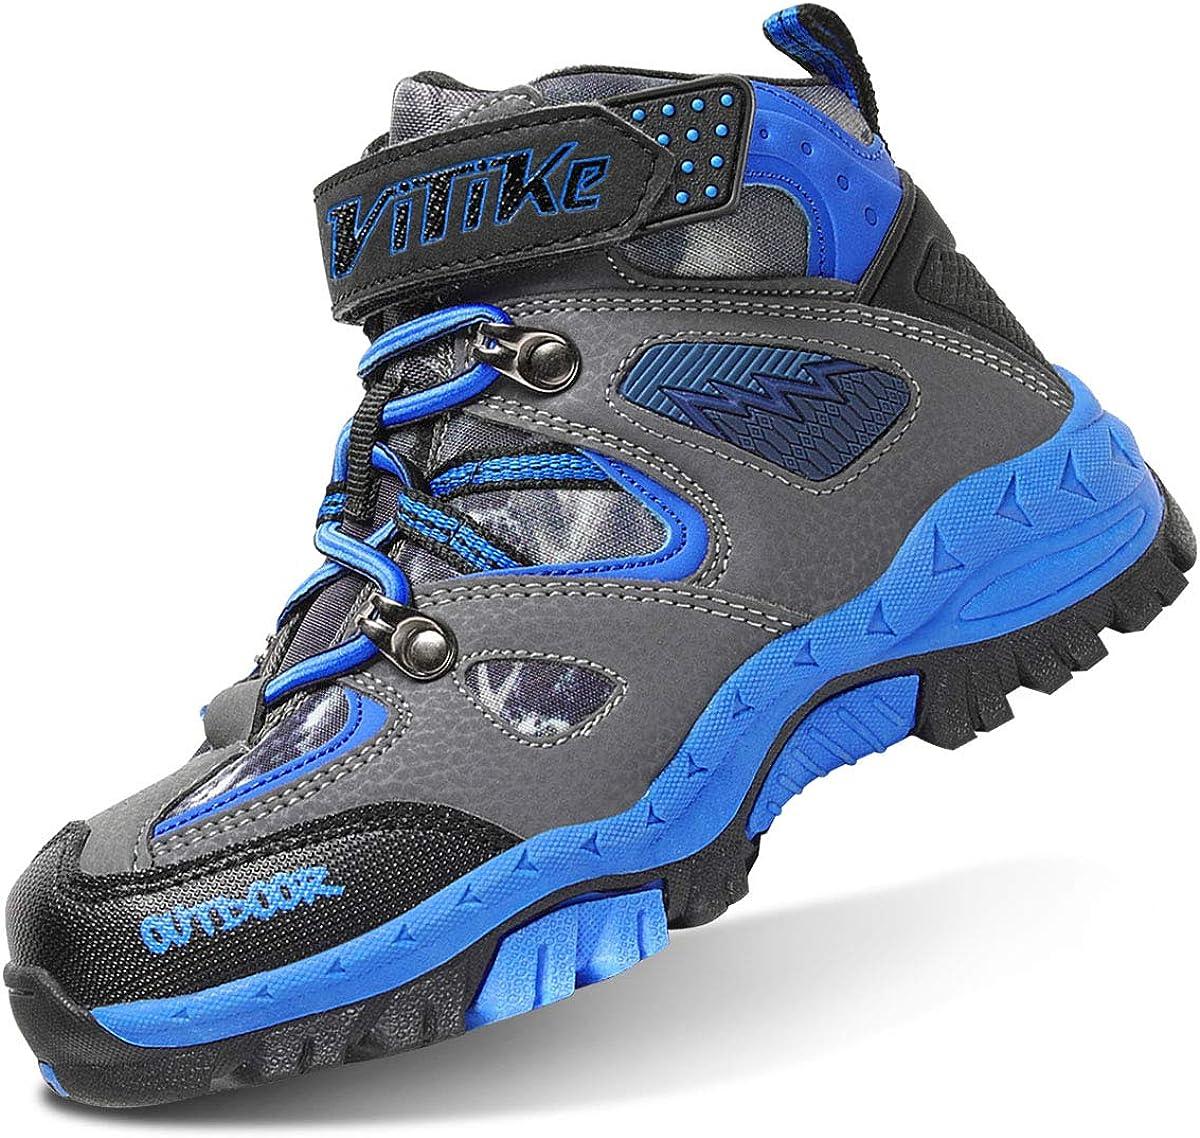 brooman Kids Waterproof Hiking Boots Boys Girls Outdoor Adventure Shoes